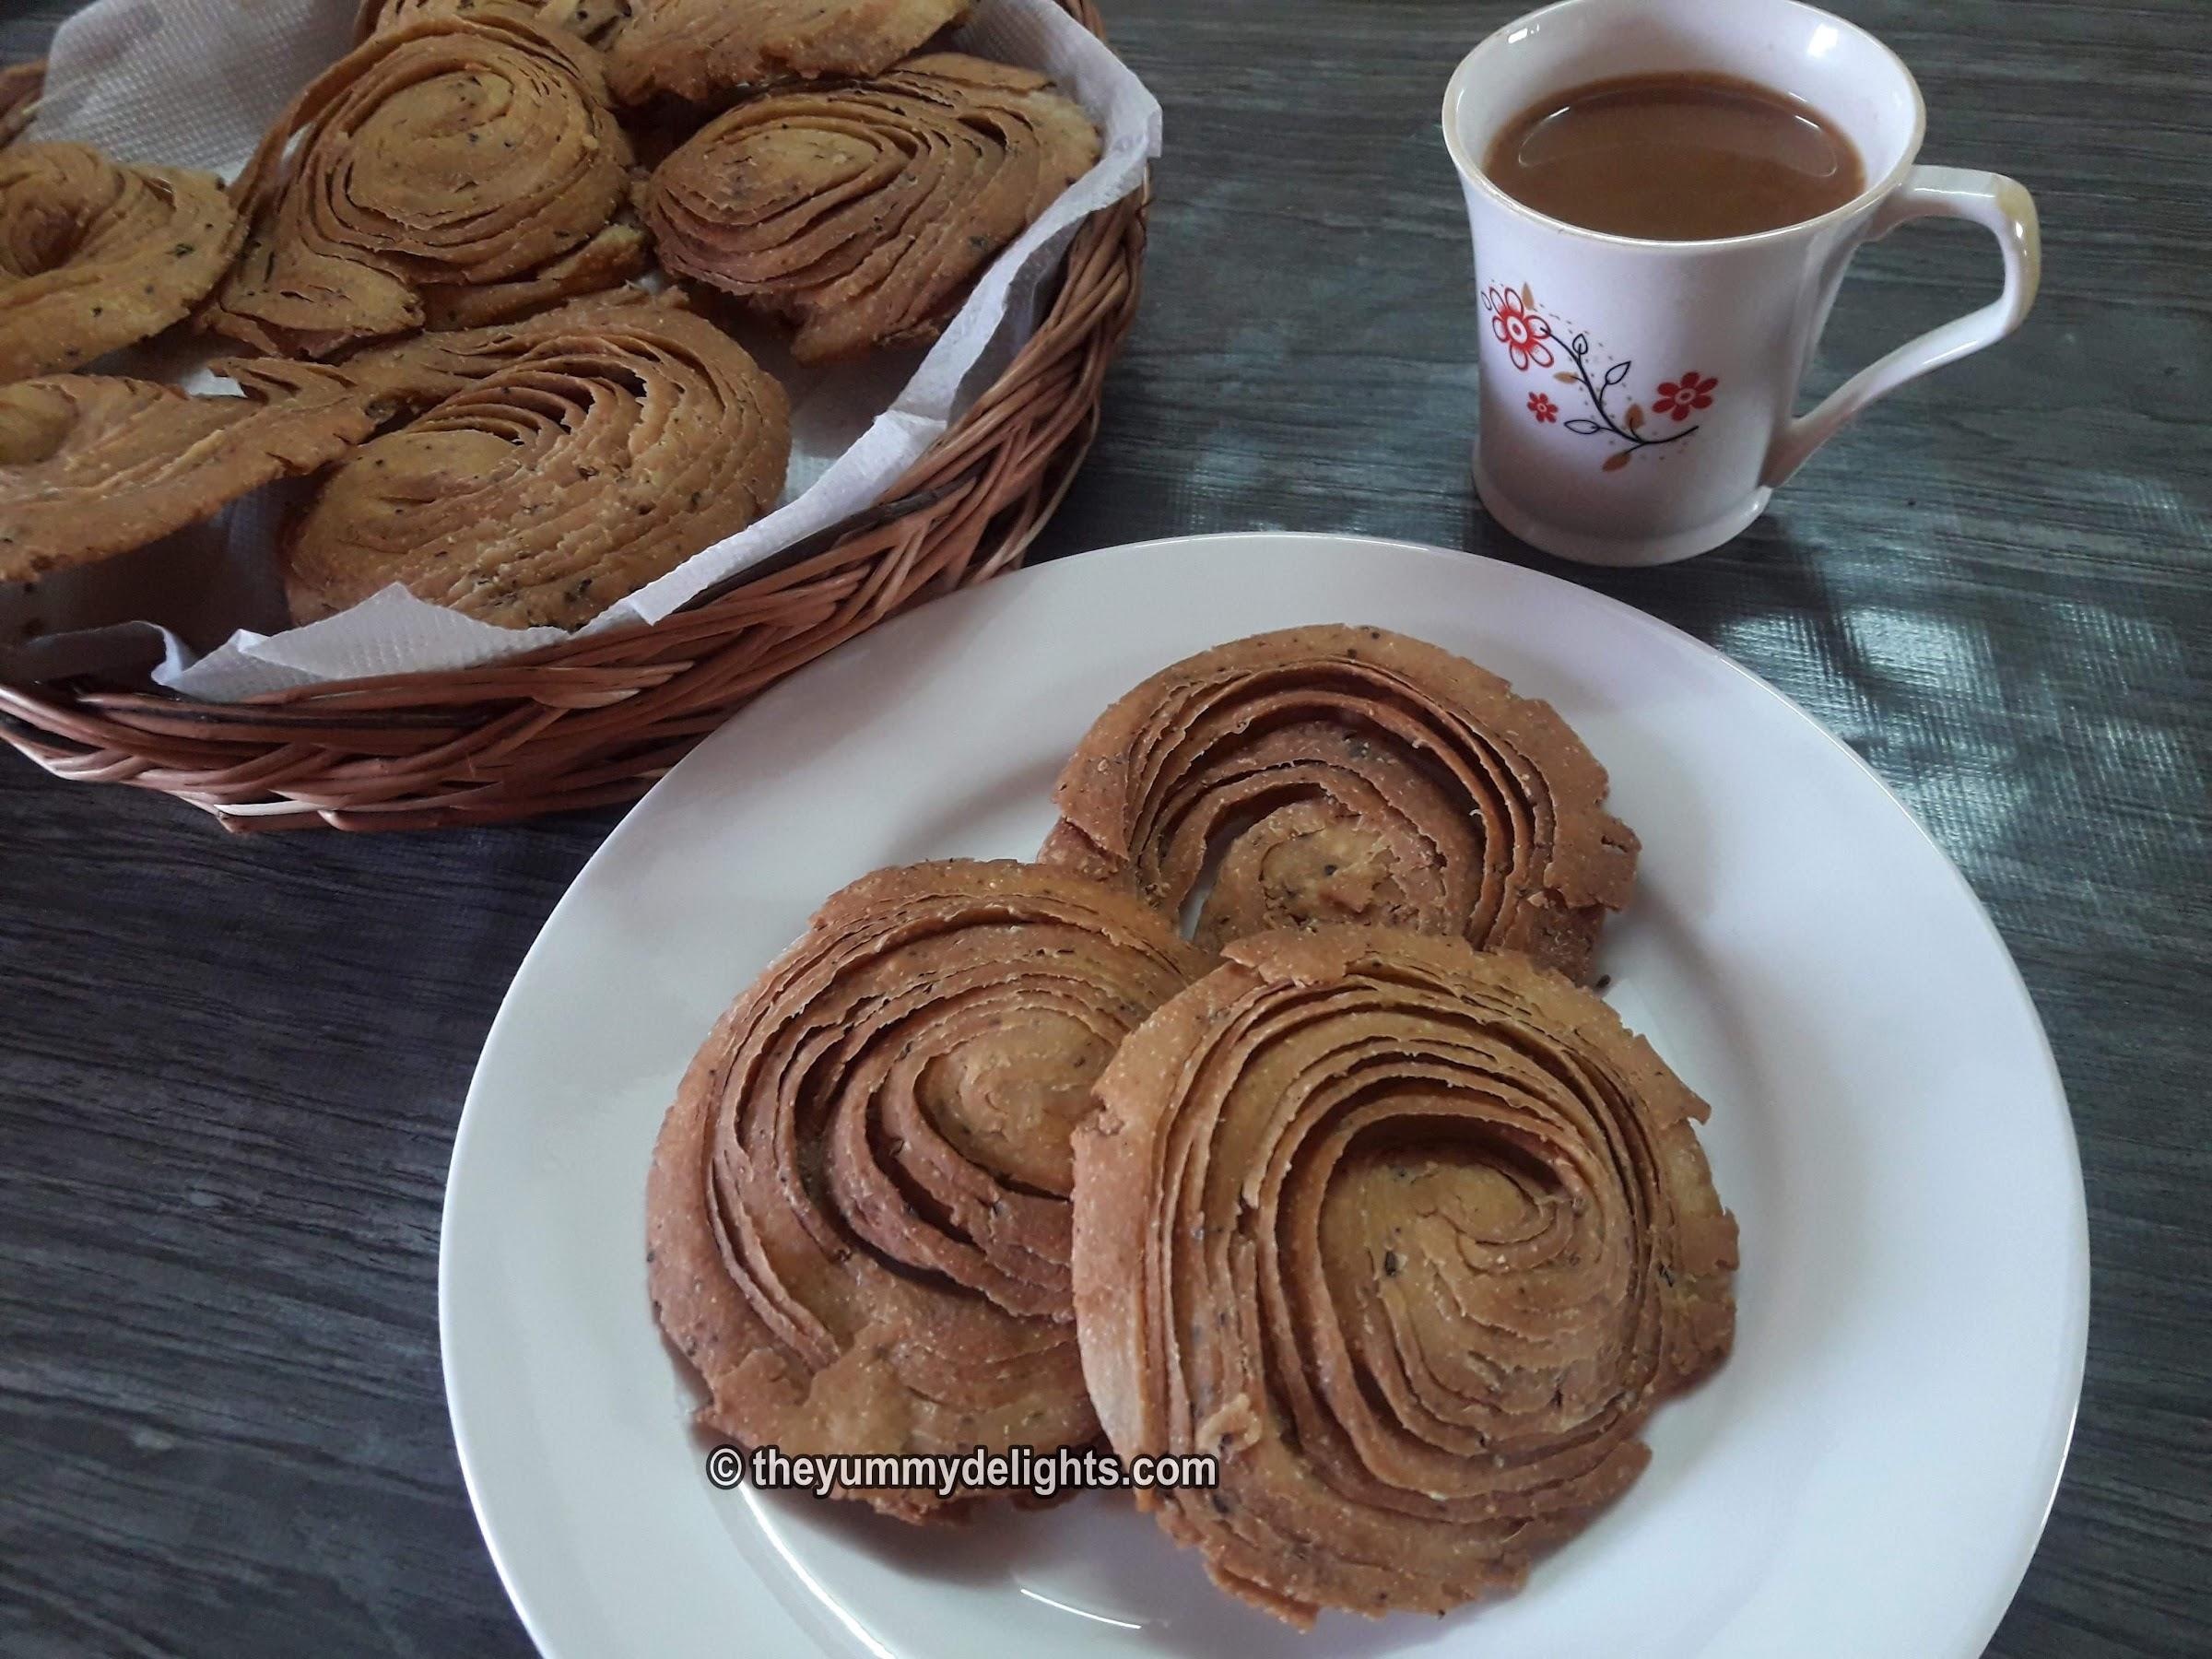 Verki puri served with tea